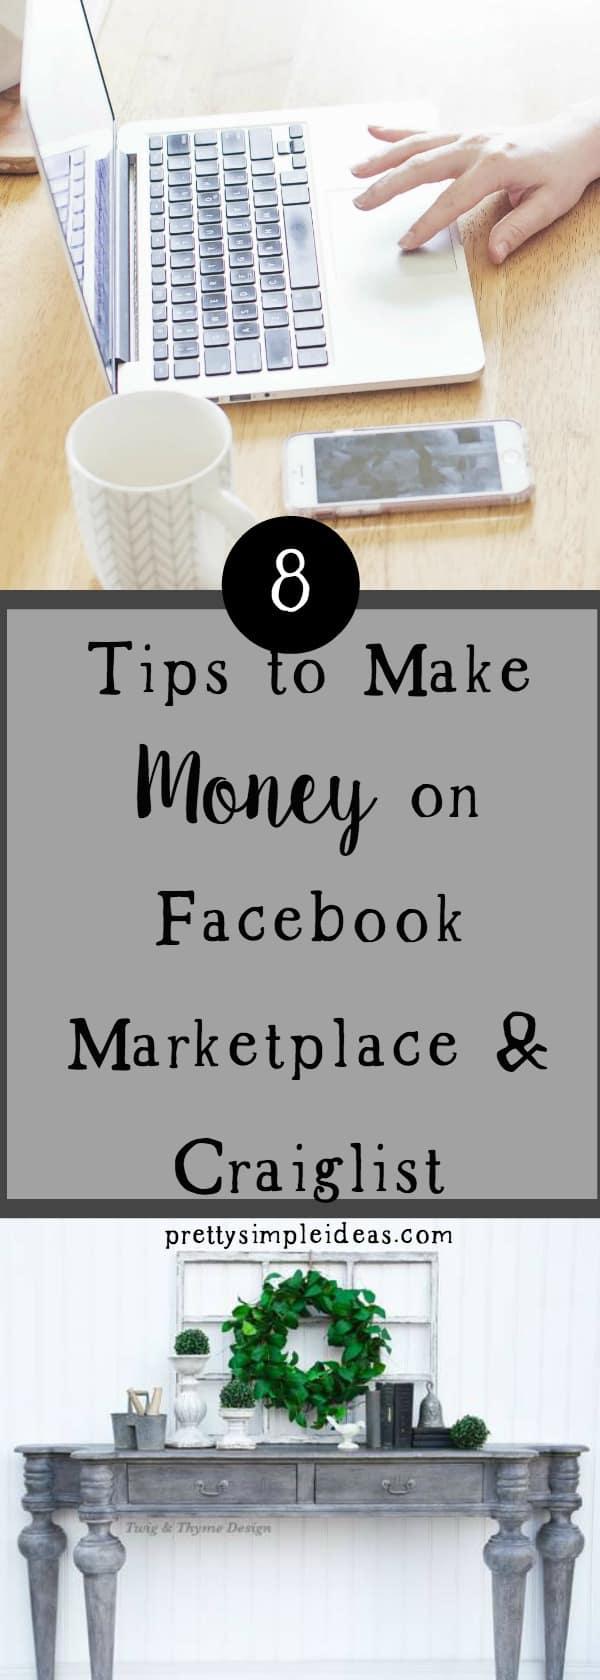 make money on facebook marketplace craigslist